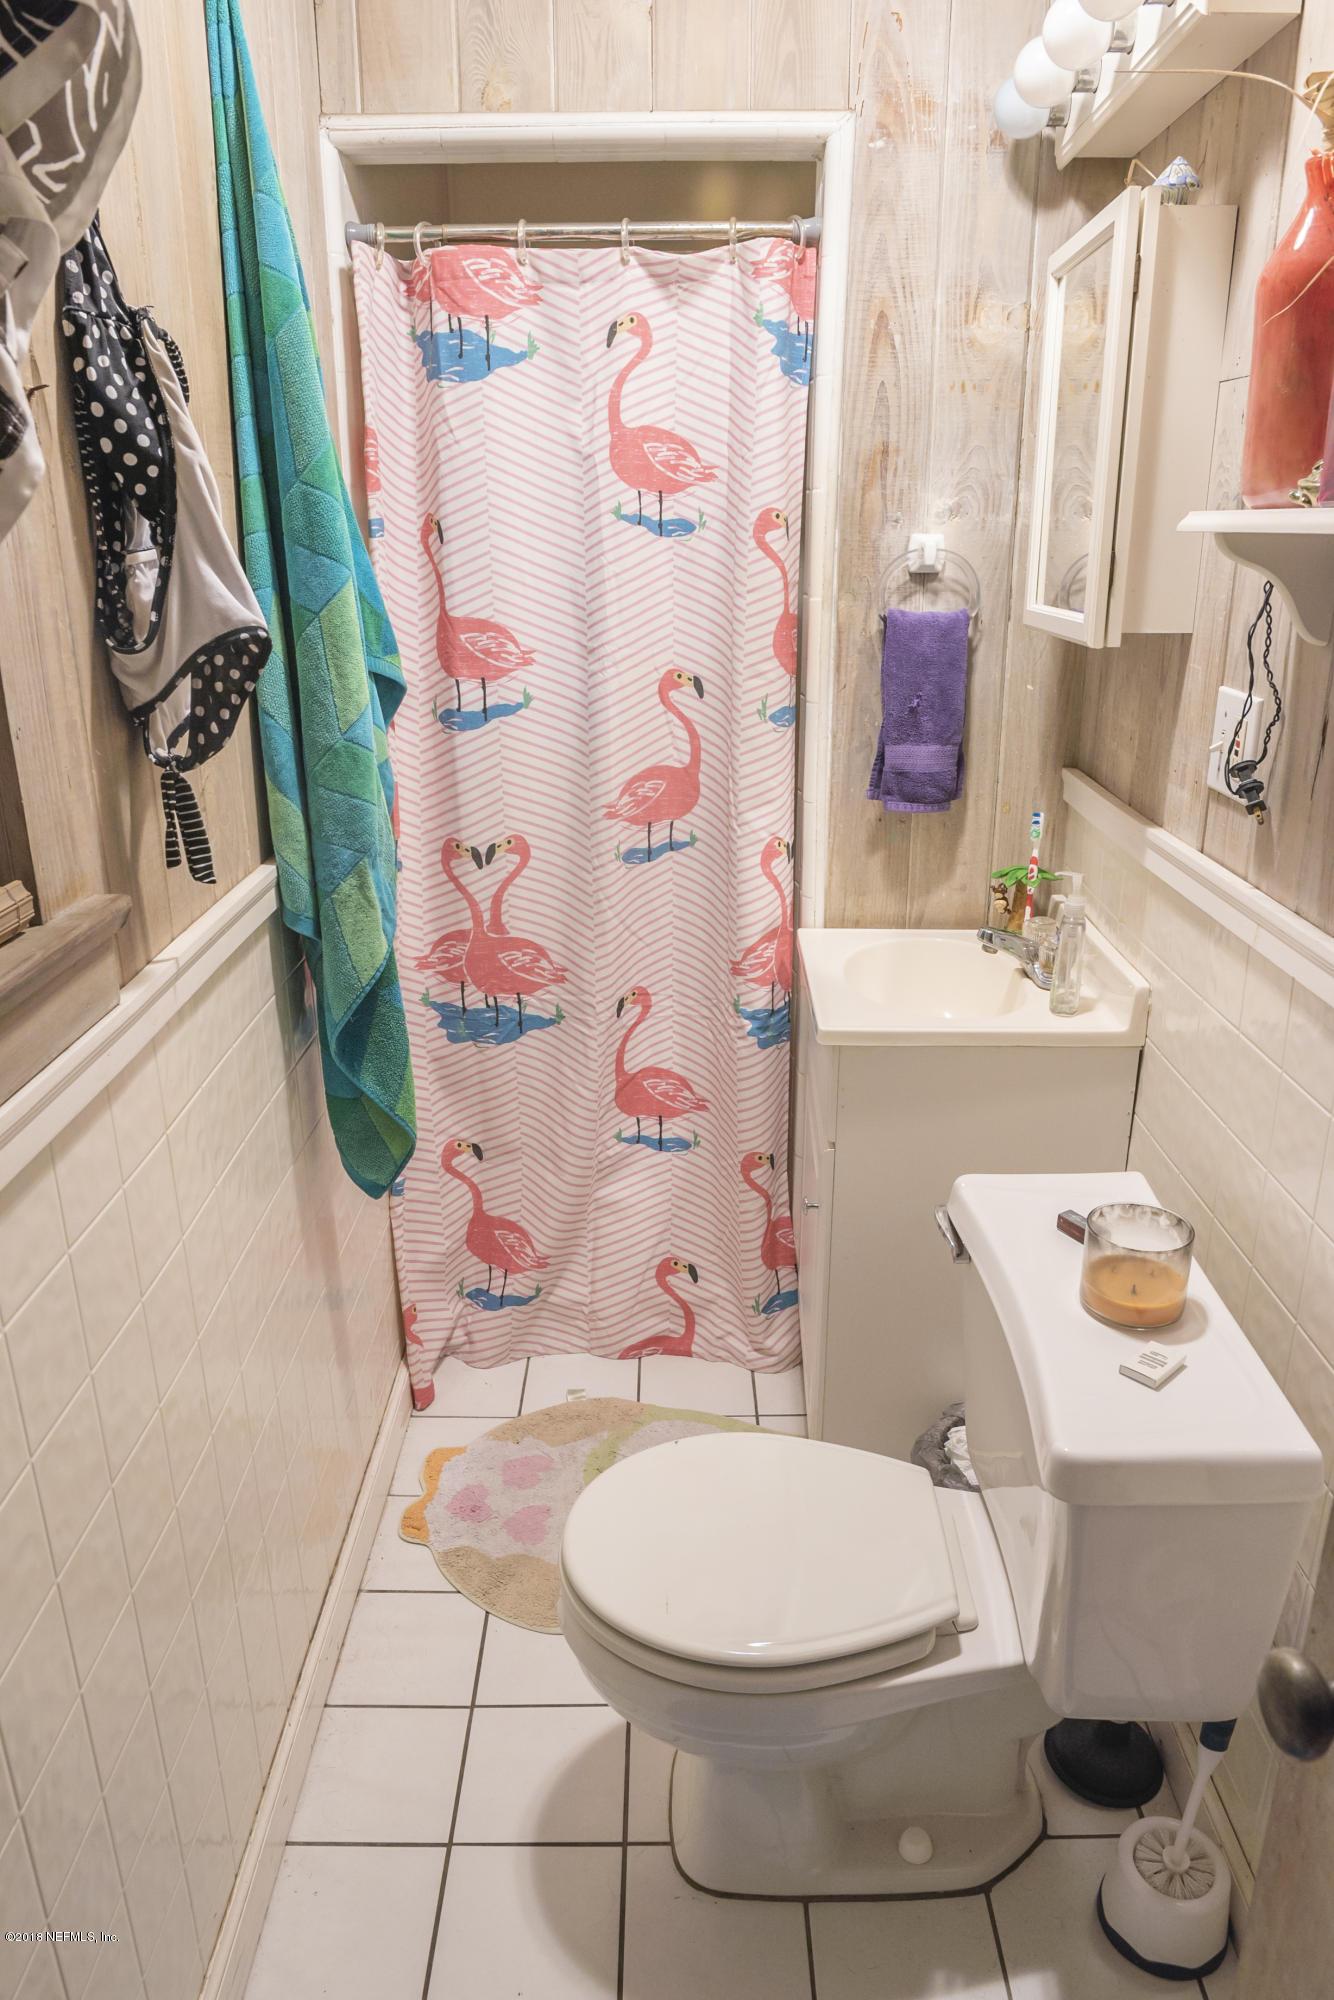 2230 OCEAN, JACKSONVILLE BEACH, FLORIDA 32250, 4 Bedrooms Bedrooms, ,3 BathroomsBathrooms,Residential - single family,For sale,OCEAN,947736